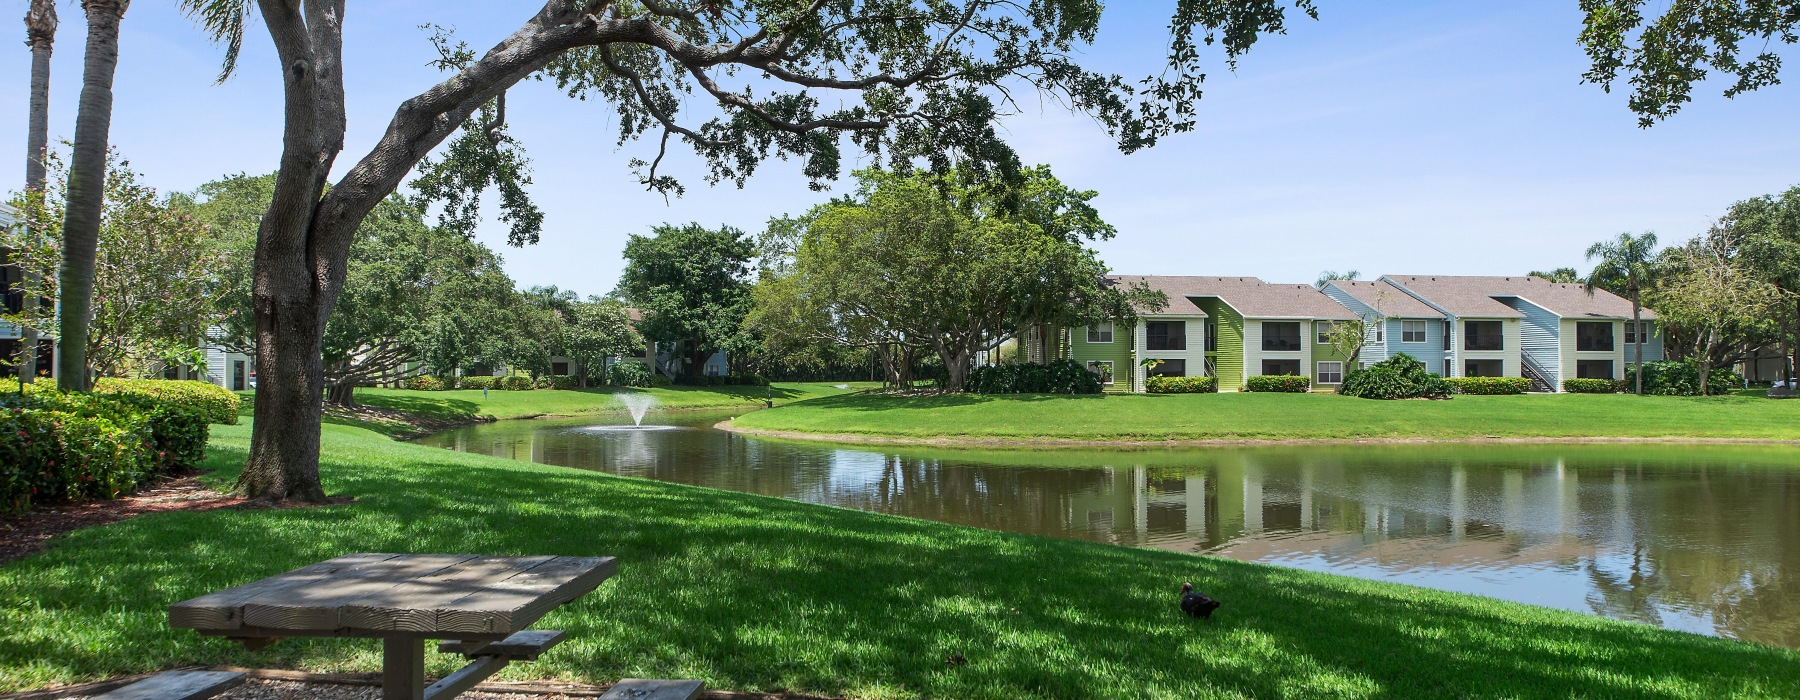 lake views with lush landscaping